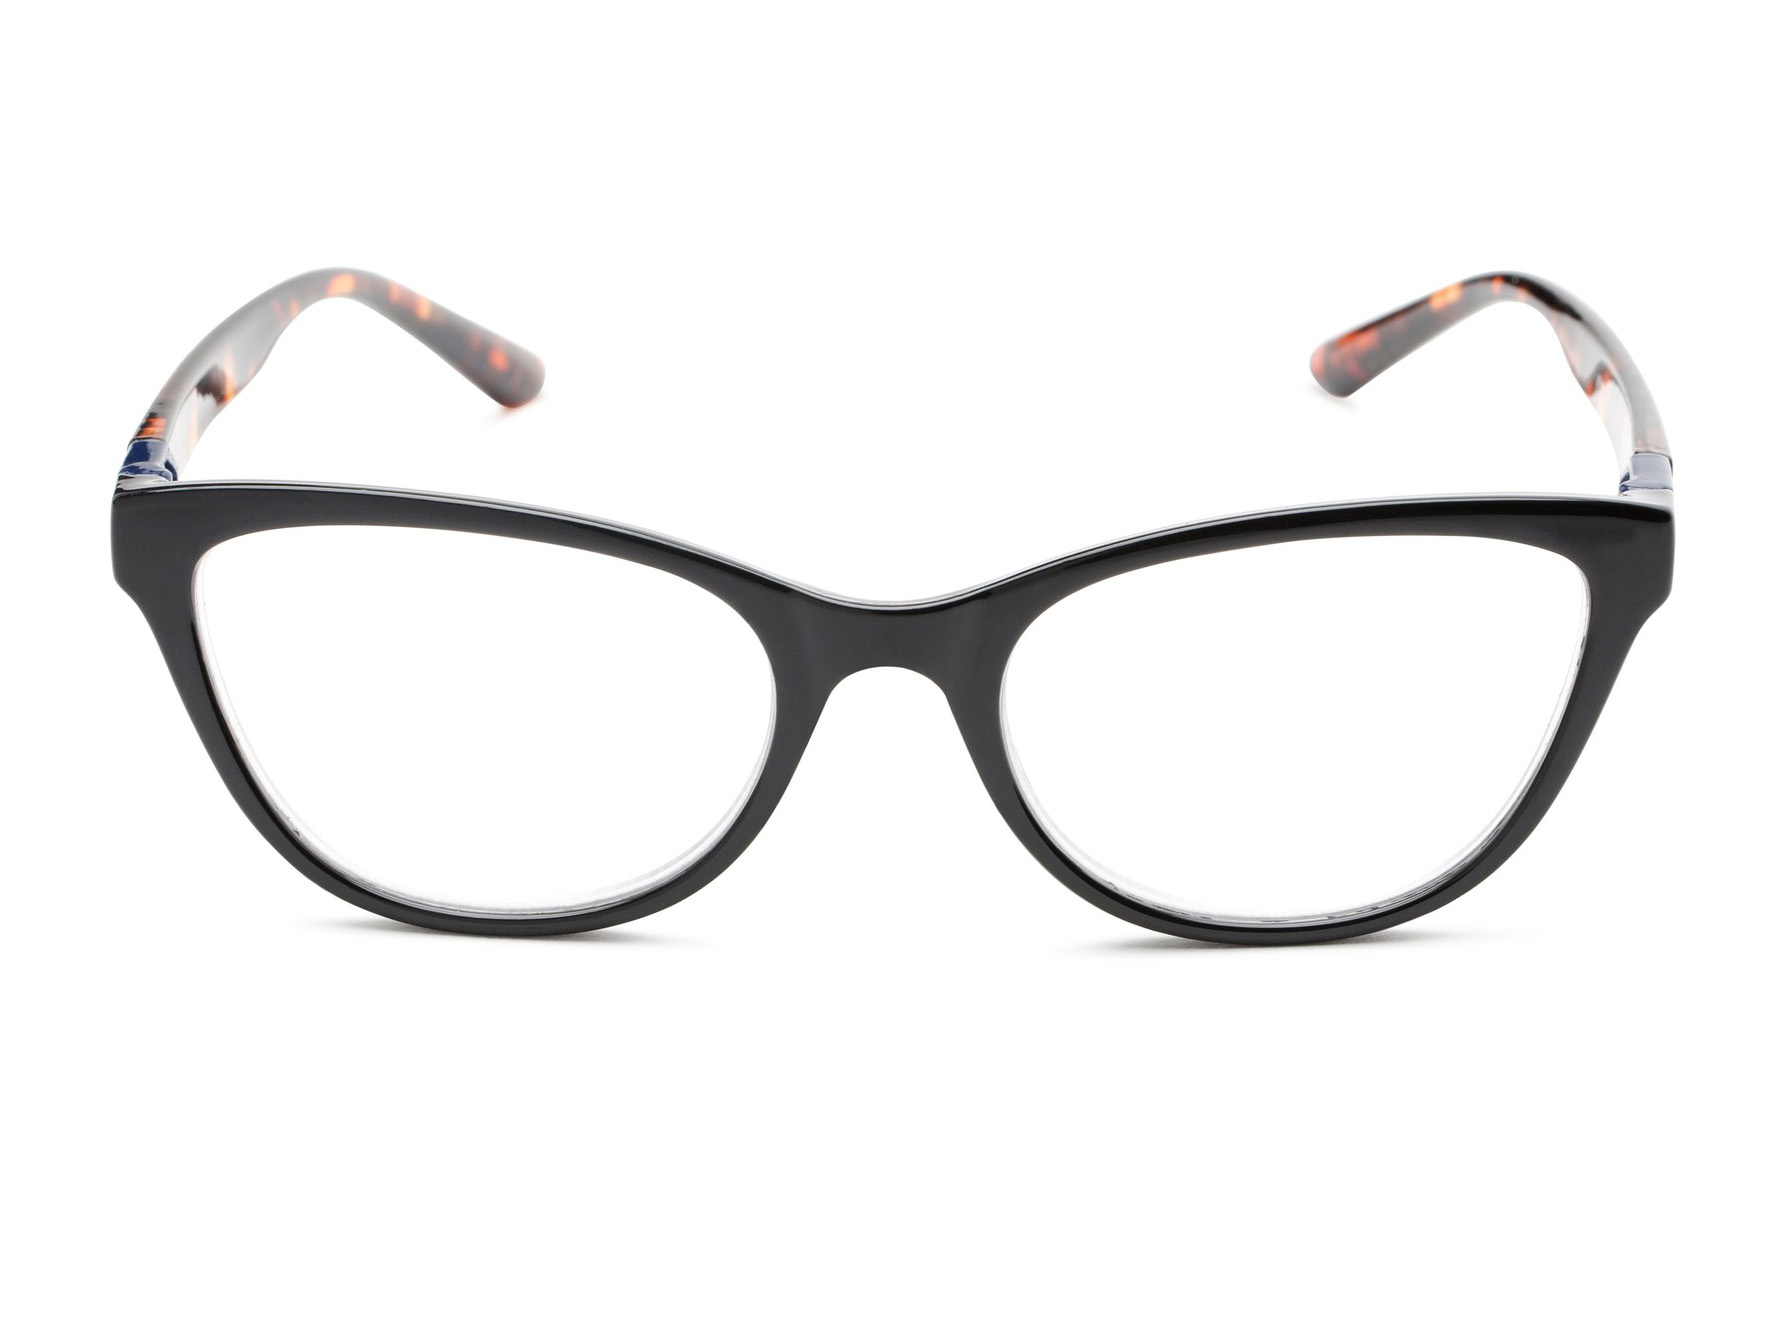 Stylish Reading Glasses - Readers